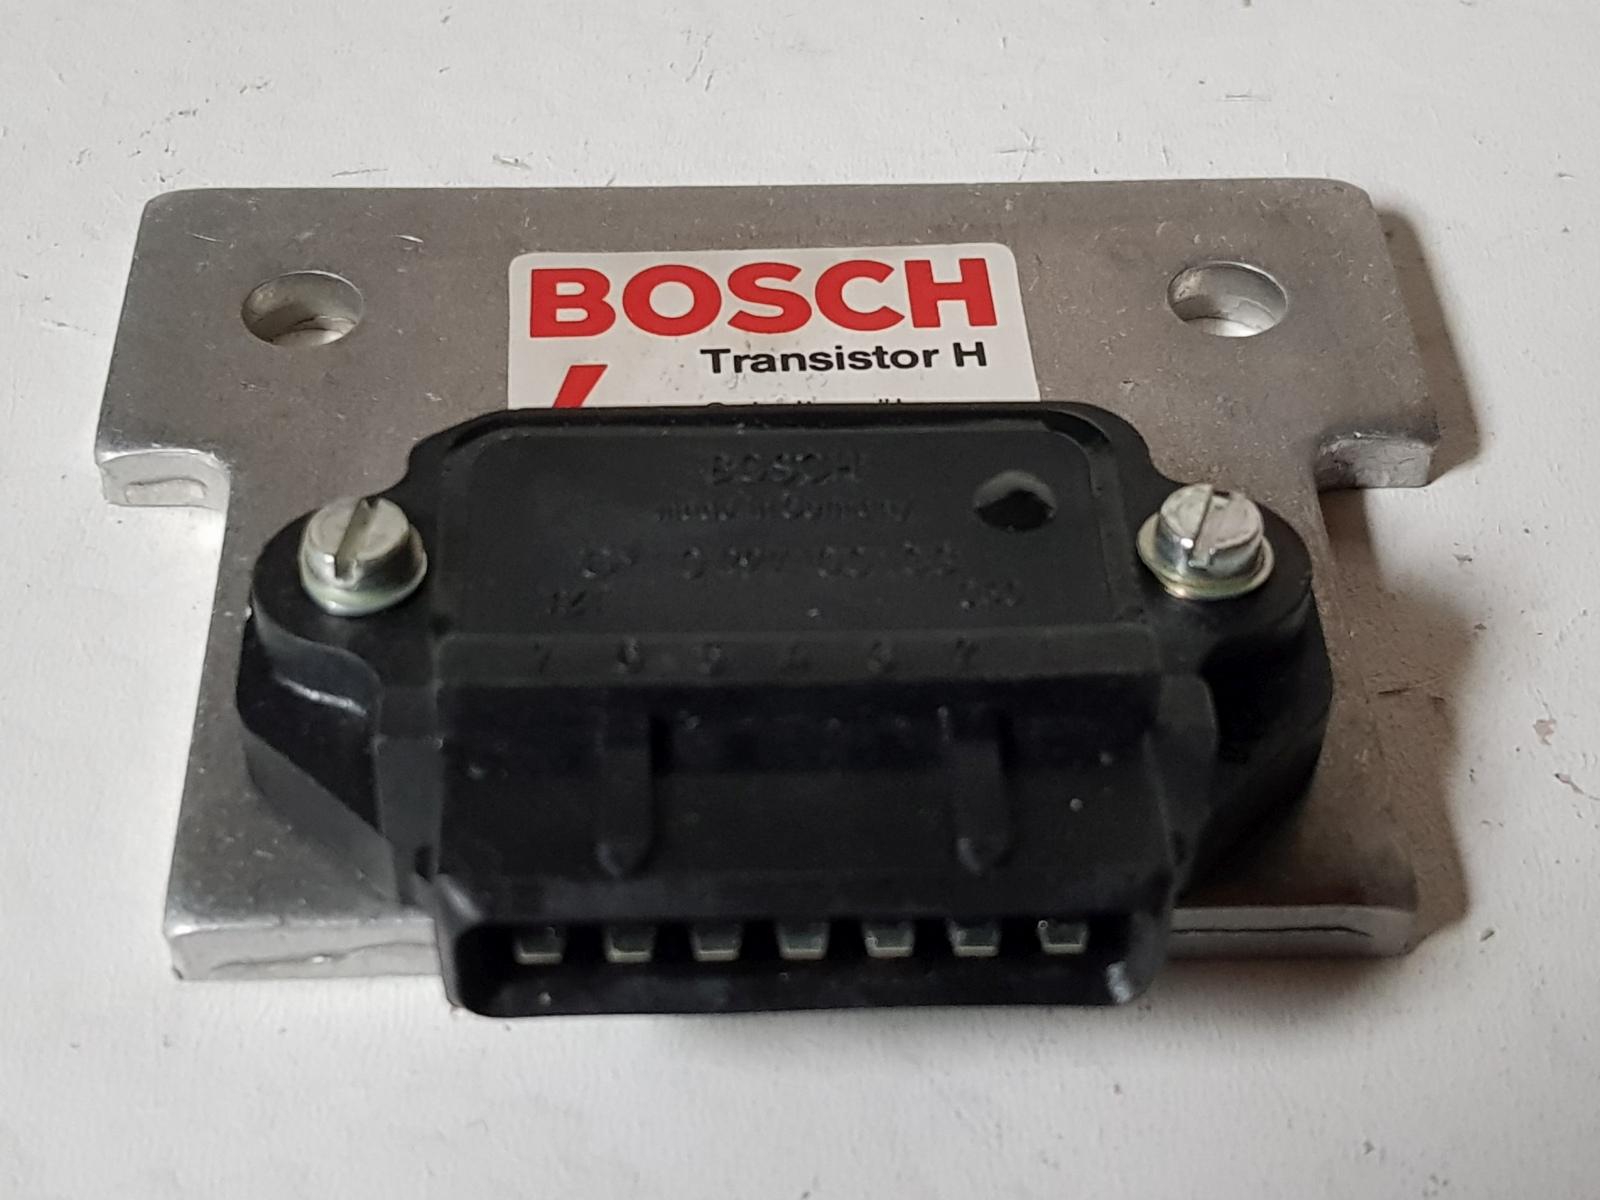 Bosch 0227100103 Transistor Schaltgerät Transistor H Steuergerät